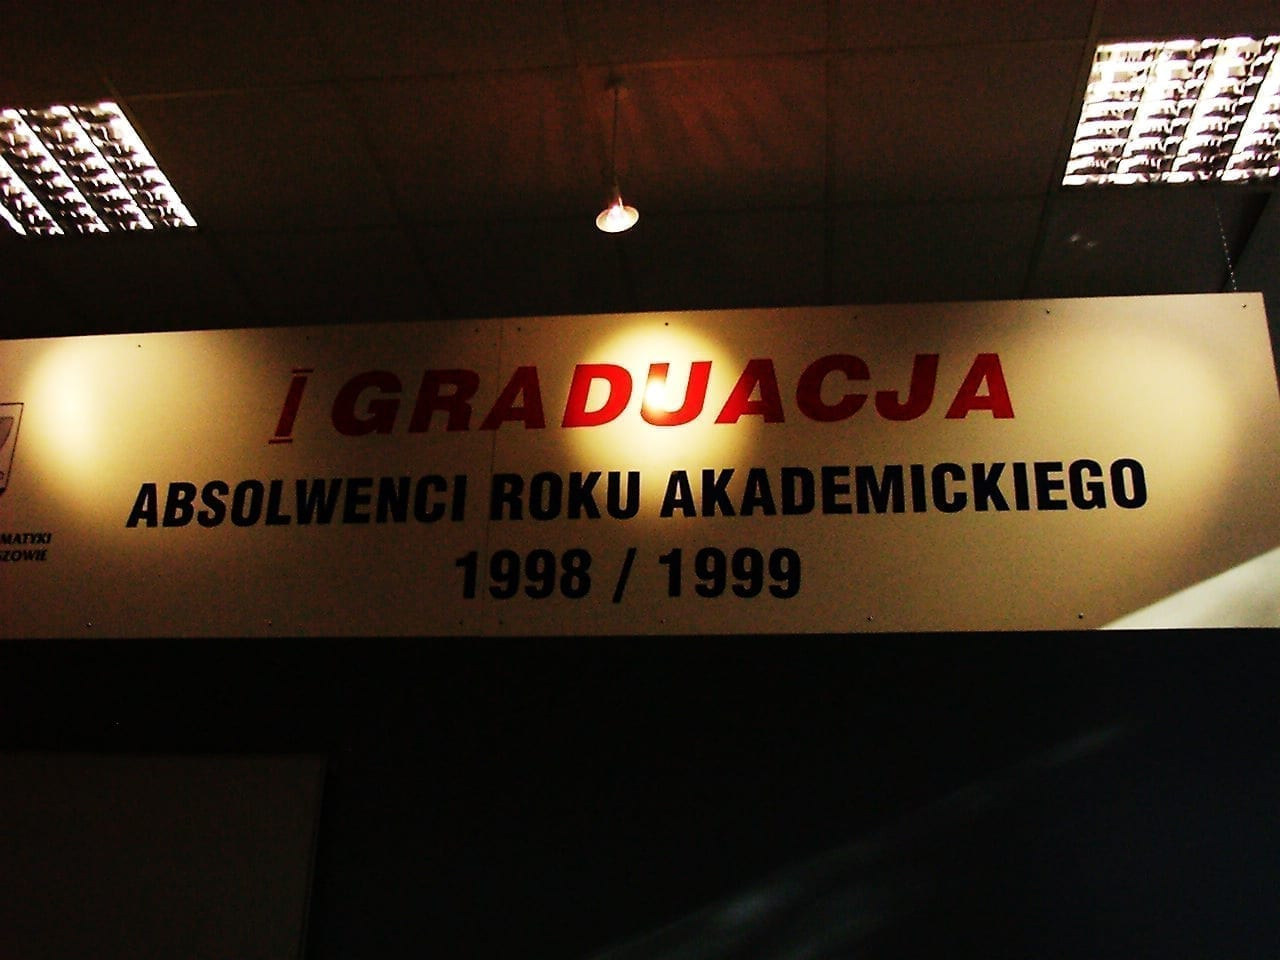 graduacja-1999-2